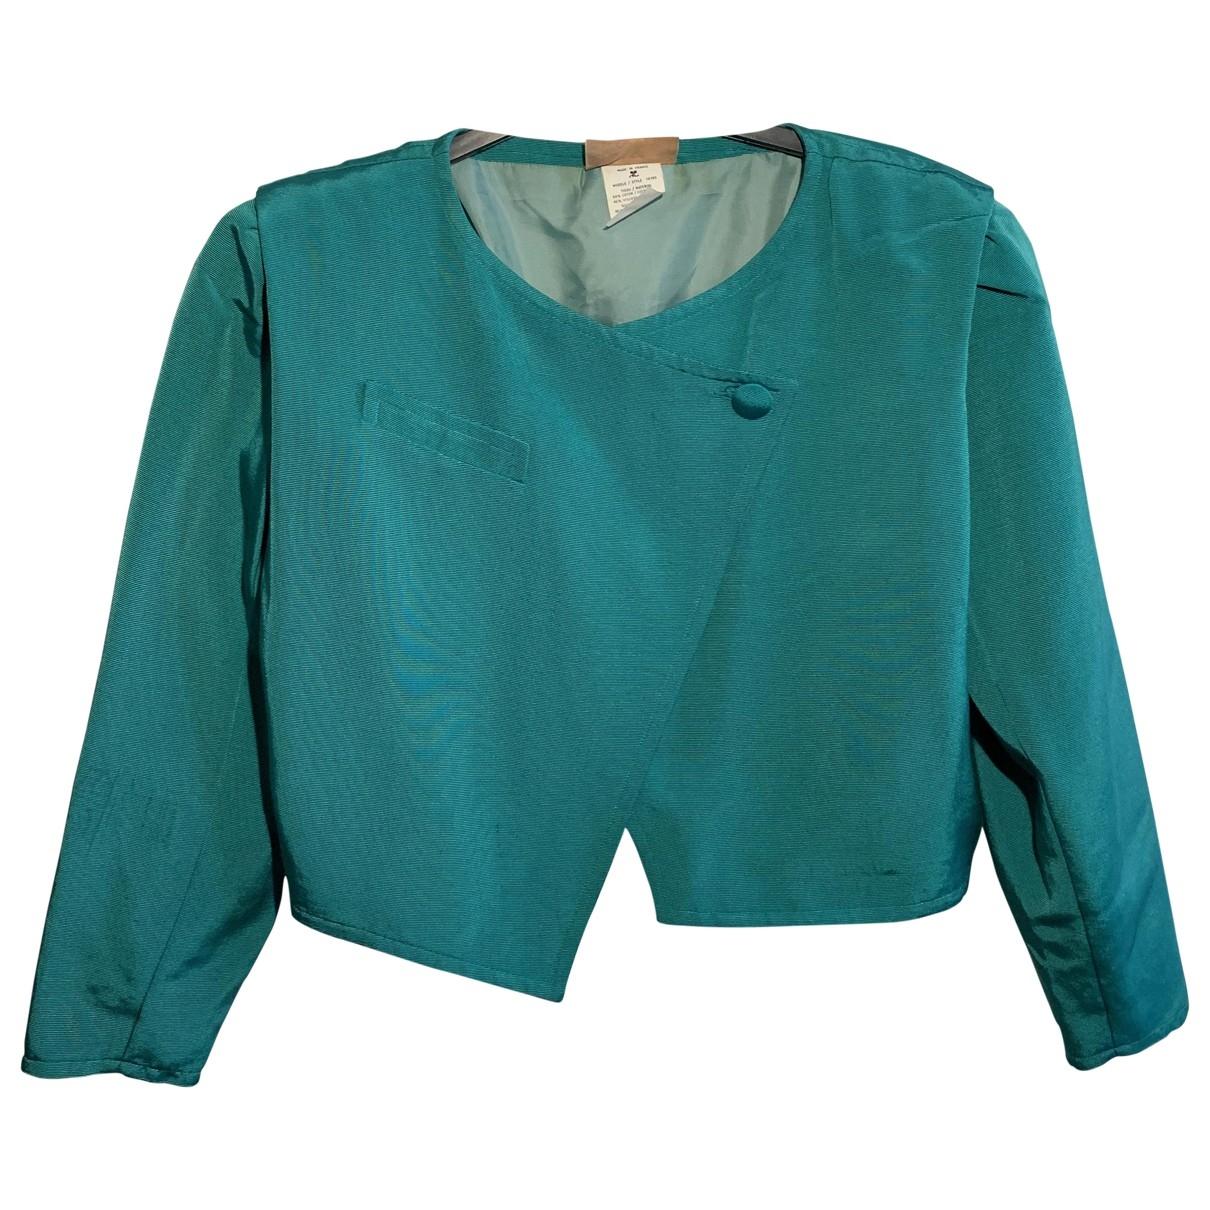 Courrèges \N Turquoise Cotton jacket for Women 36 FR